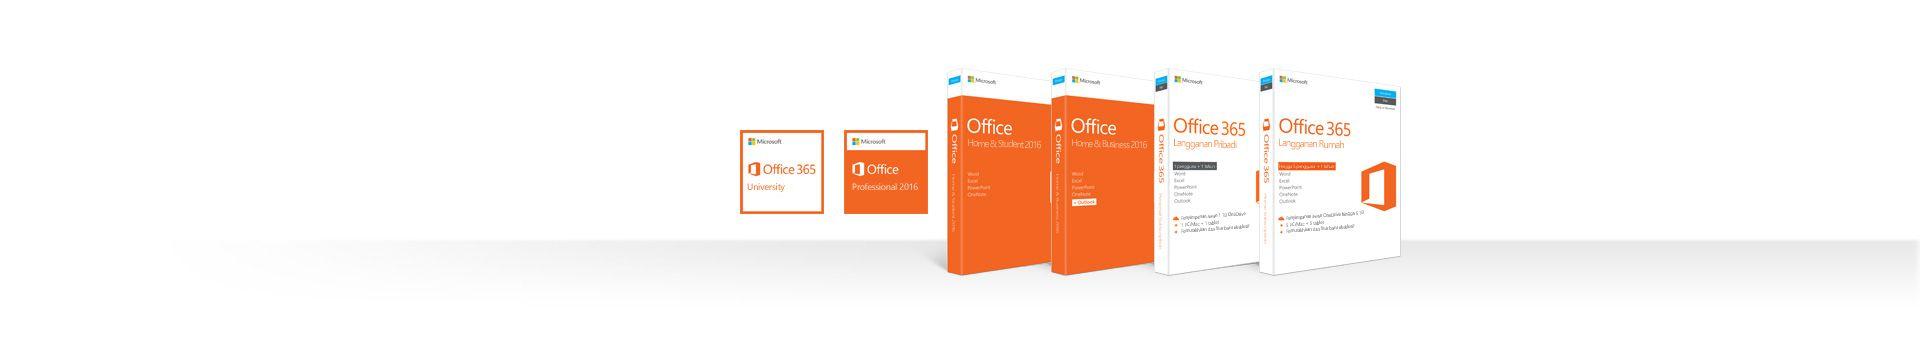 Satu baris kotak menggambarkan produk mandiri dan langganan Office untuk PC